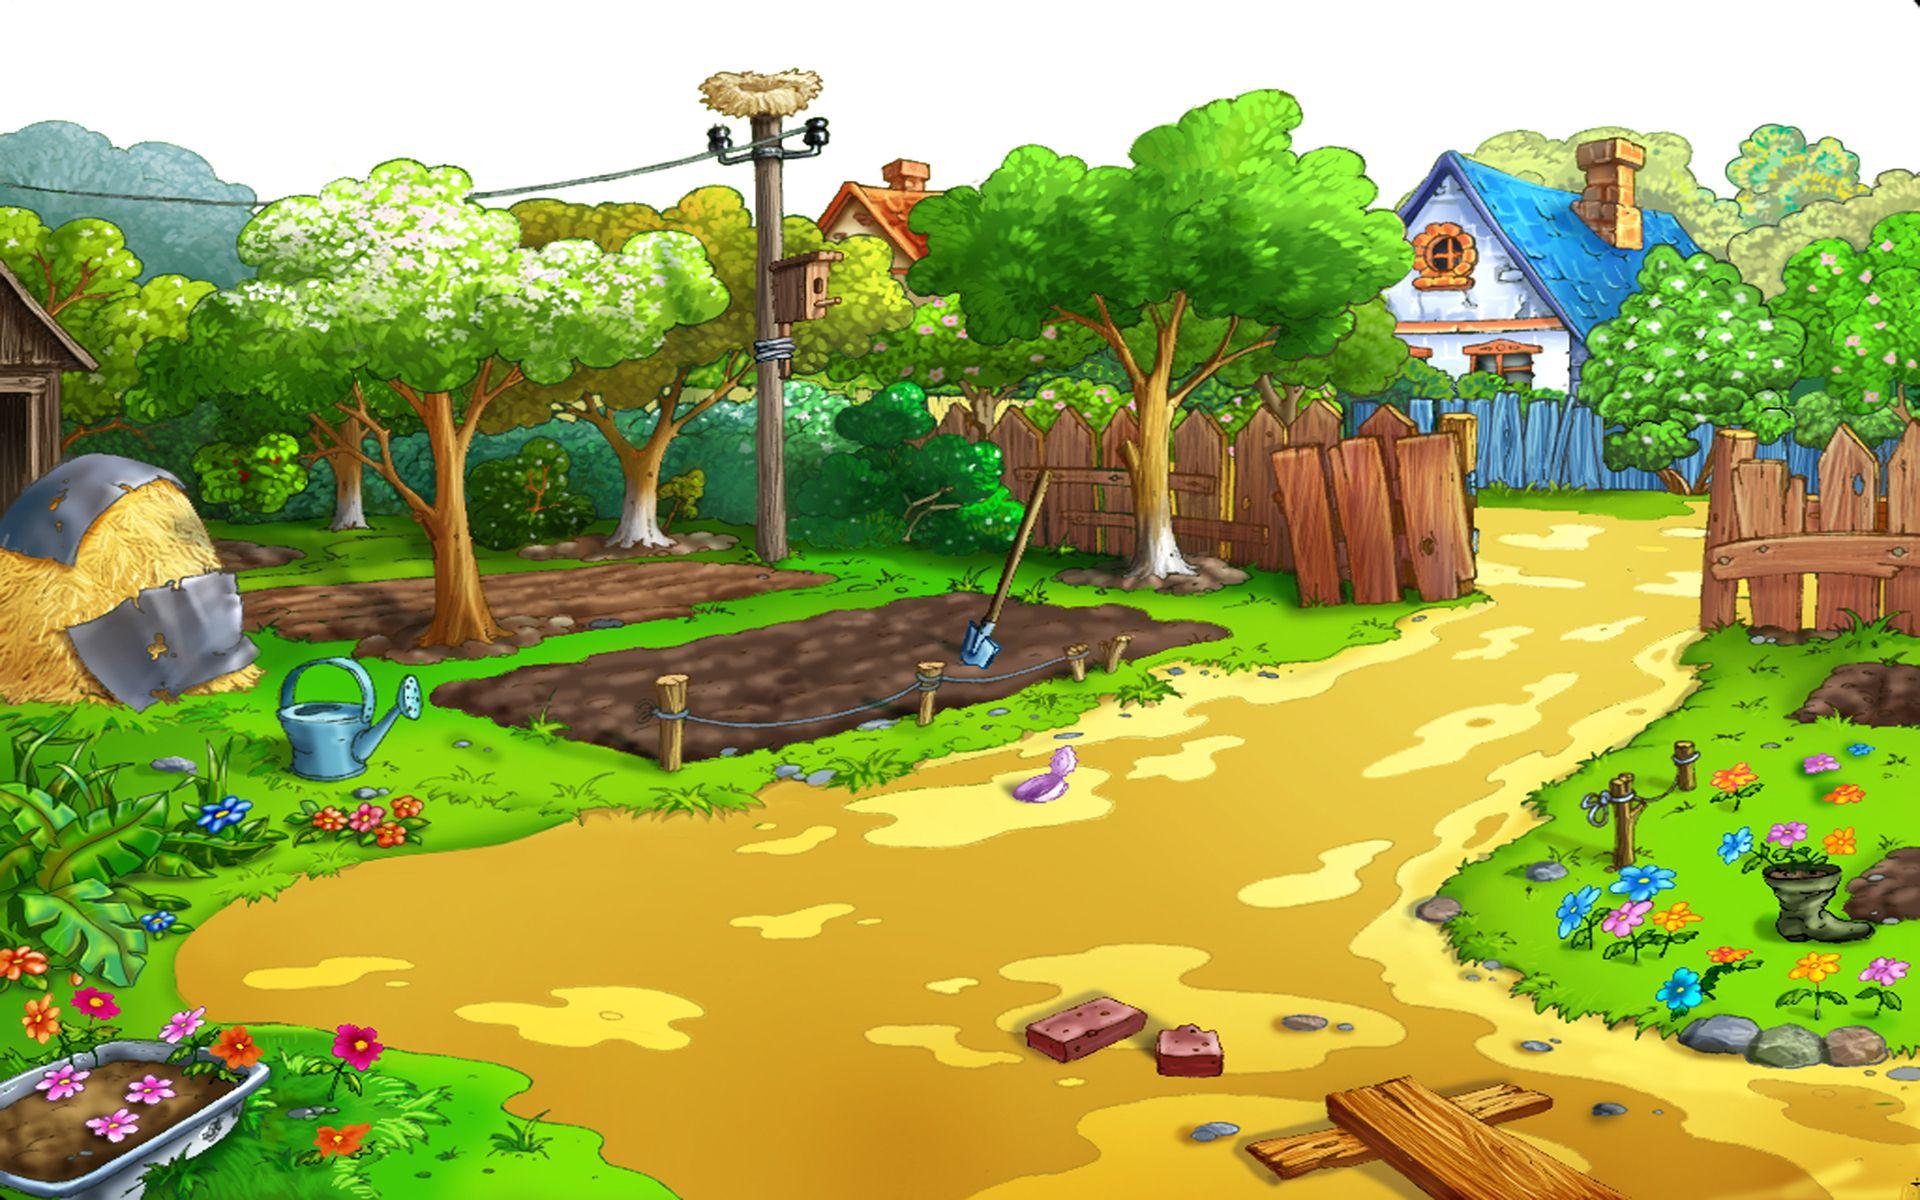 cartoon landscape backgrounds - hdwallie